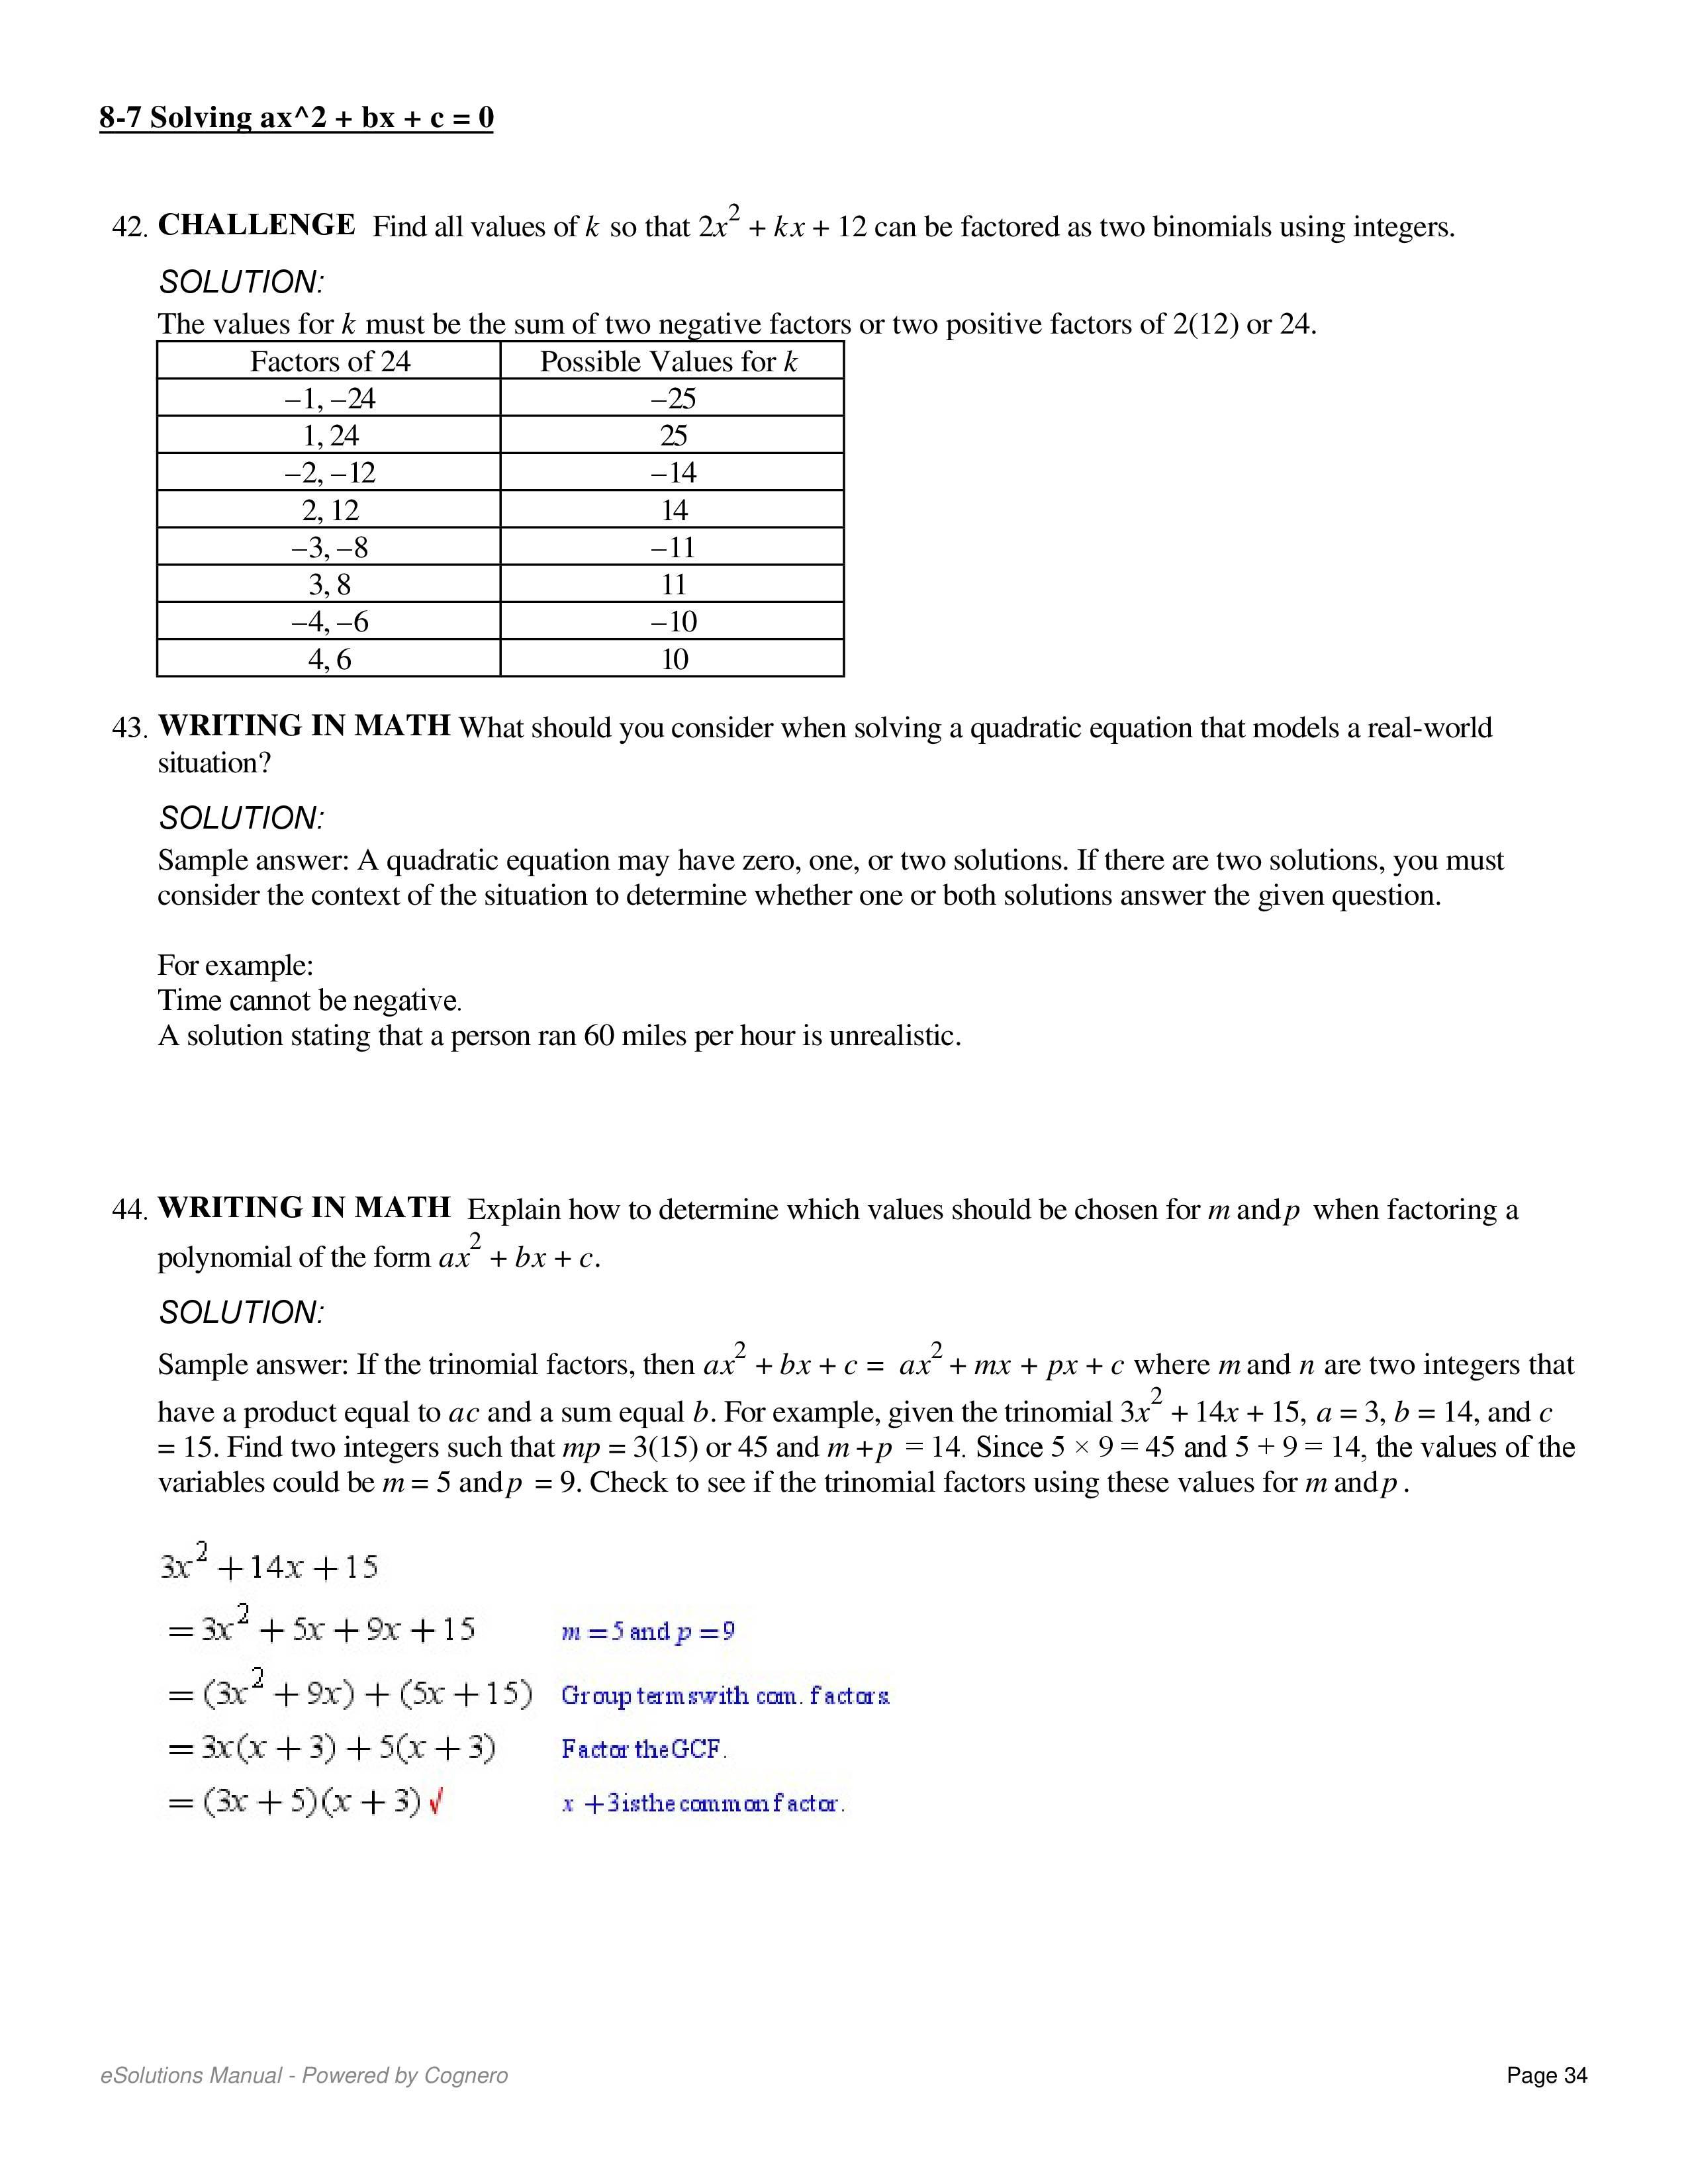 Solving Algebraic Equation - Notes